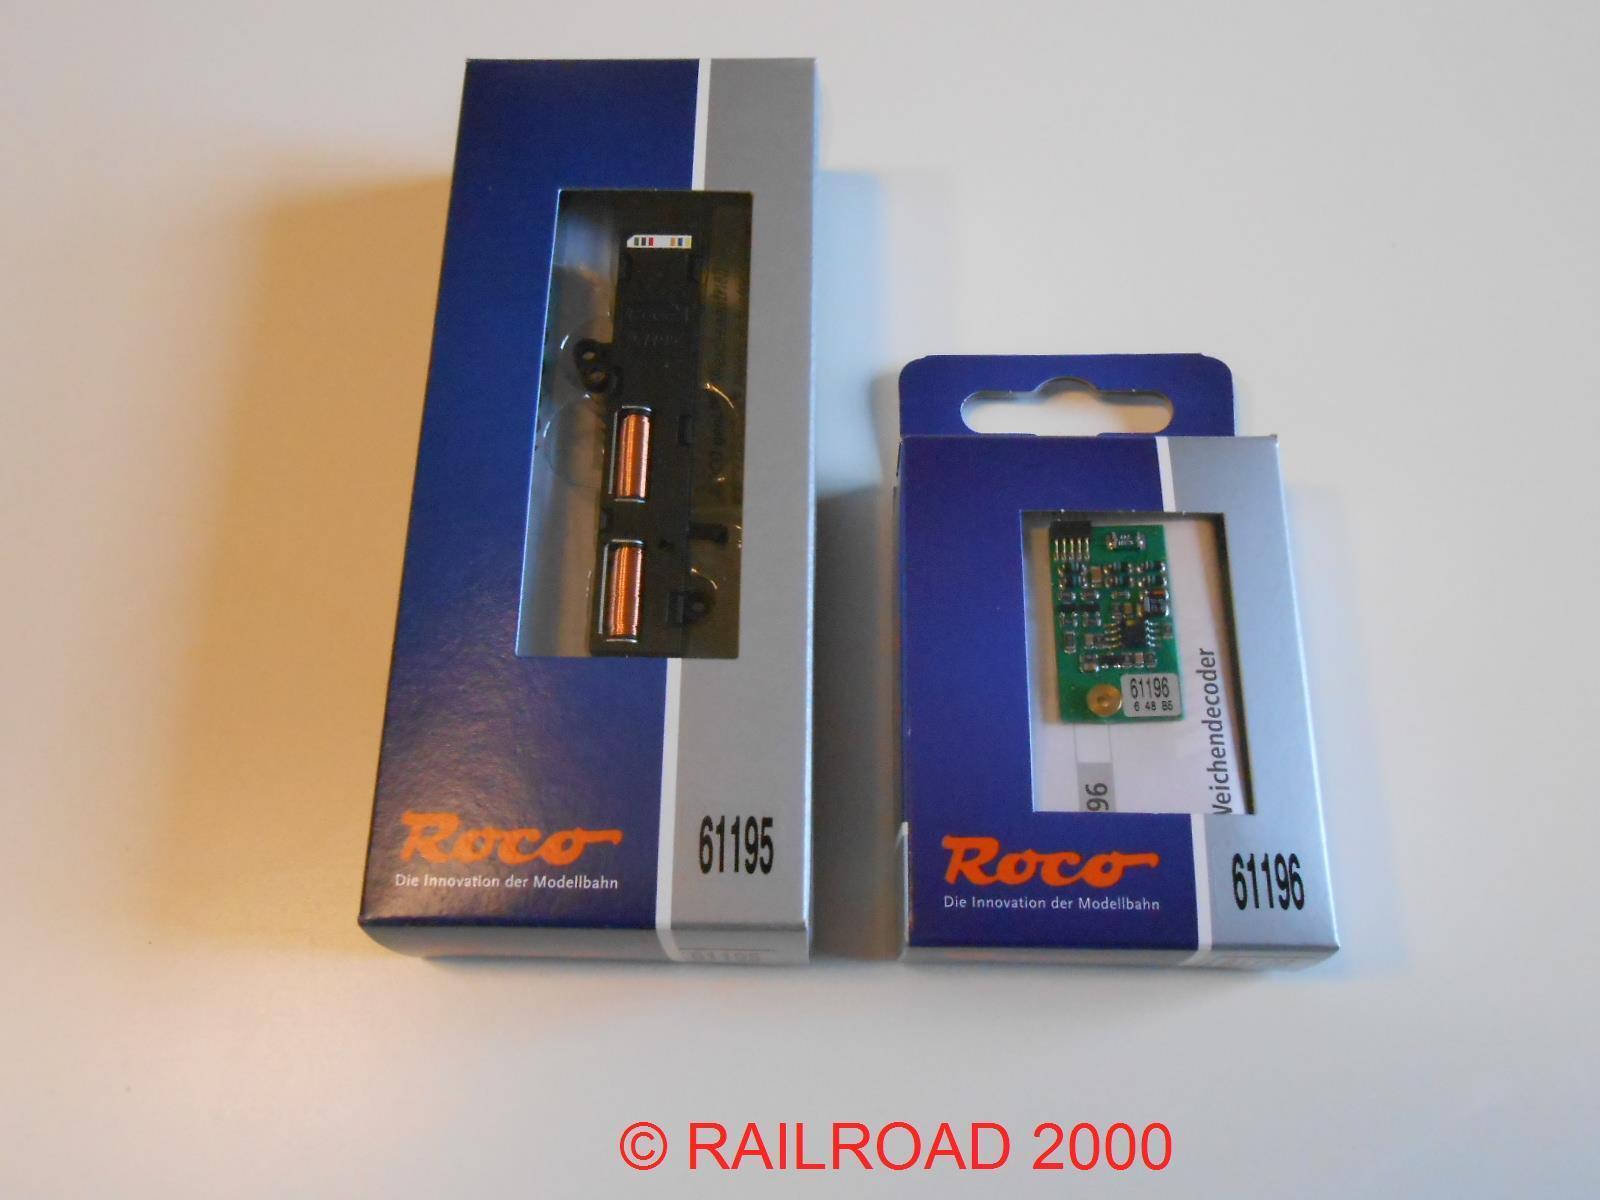 ROCO 61195 GEOLINE Universal morbido attacco + 61196 decoder, NUOVO + OVP